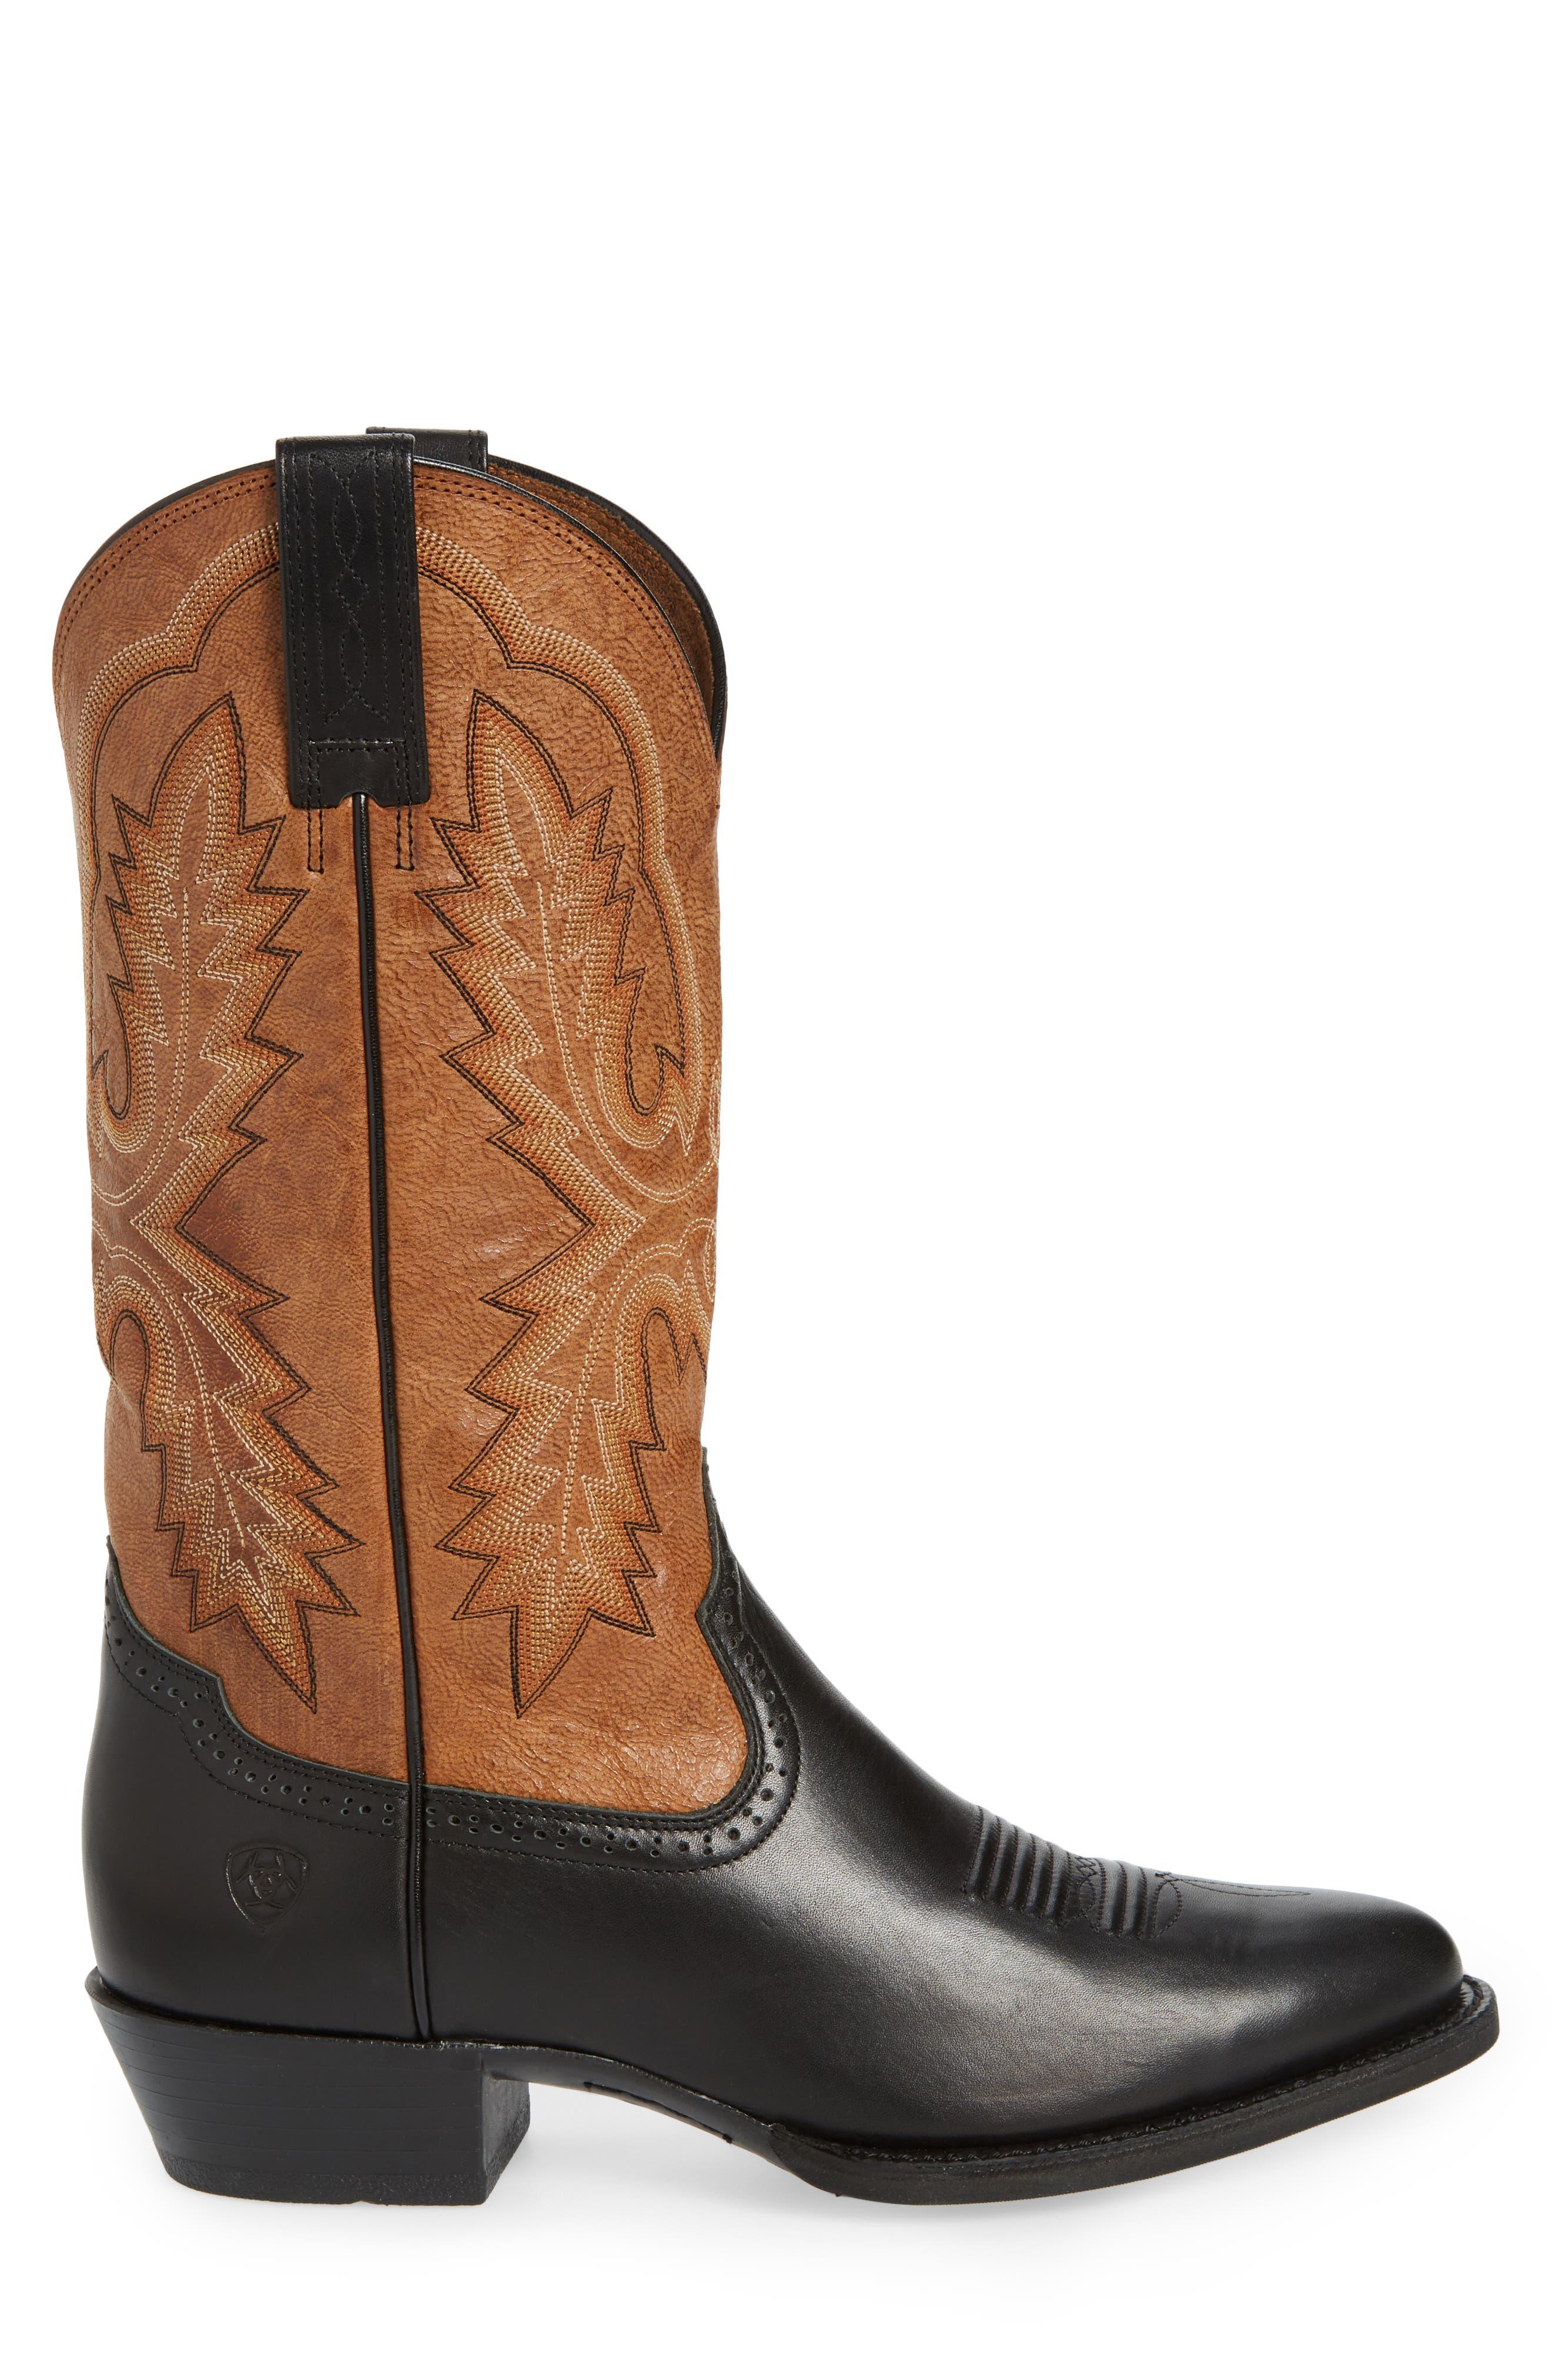 Alternate Image 3  - Ariat Heritage Calhoun Western R-Toe Boot (Men)